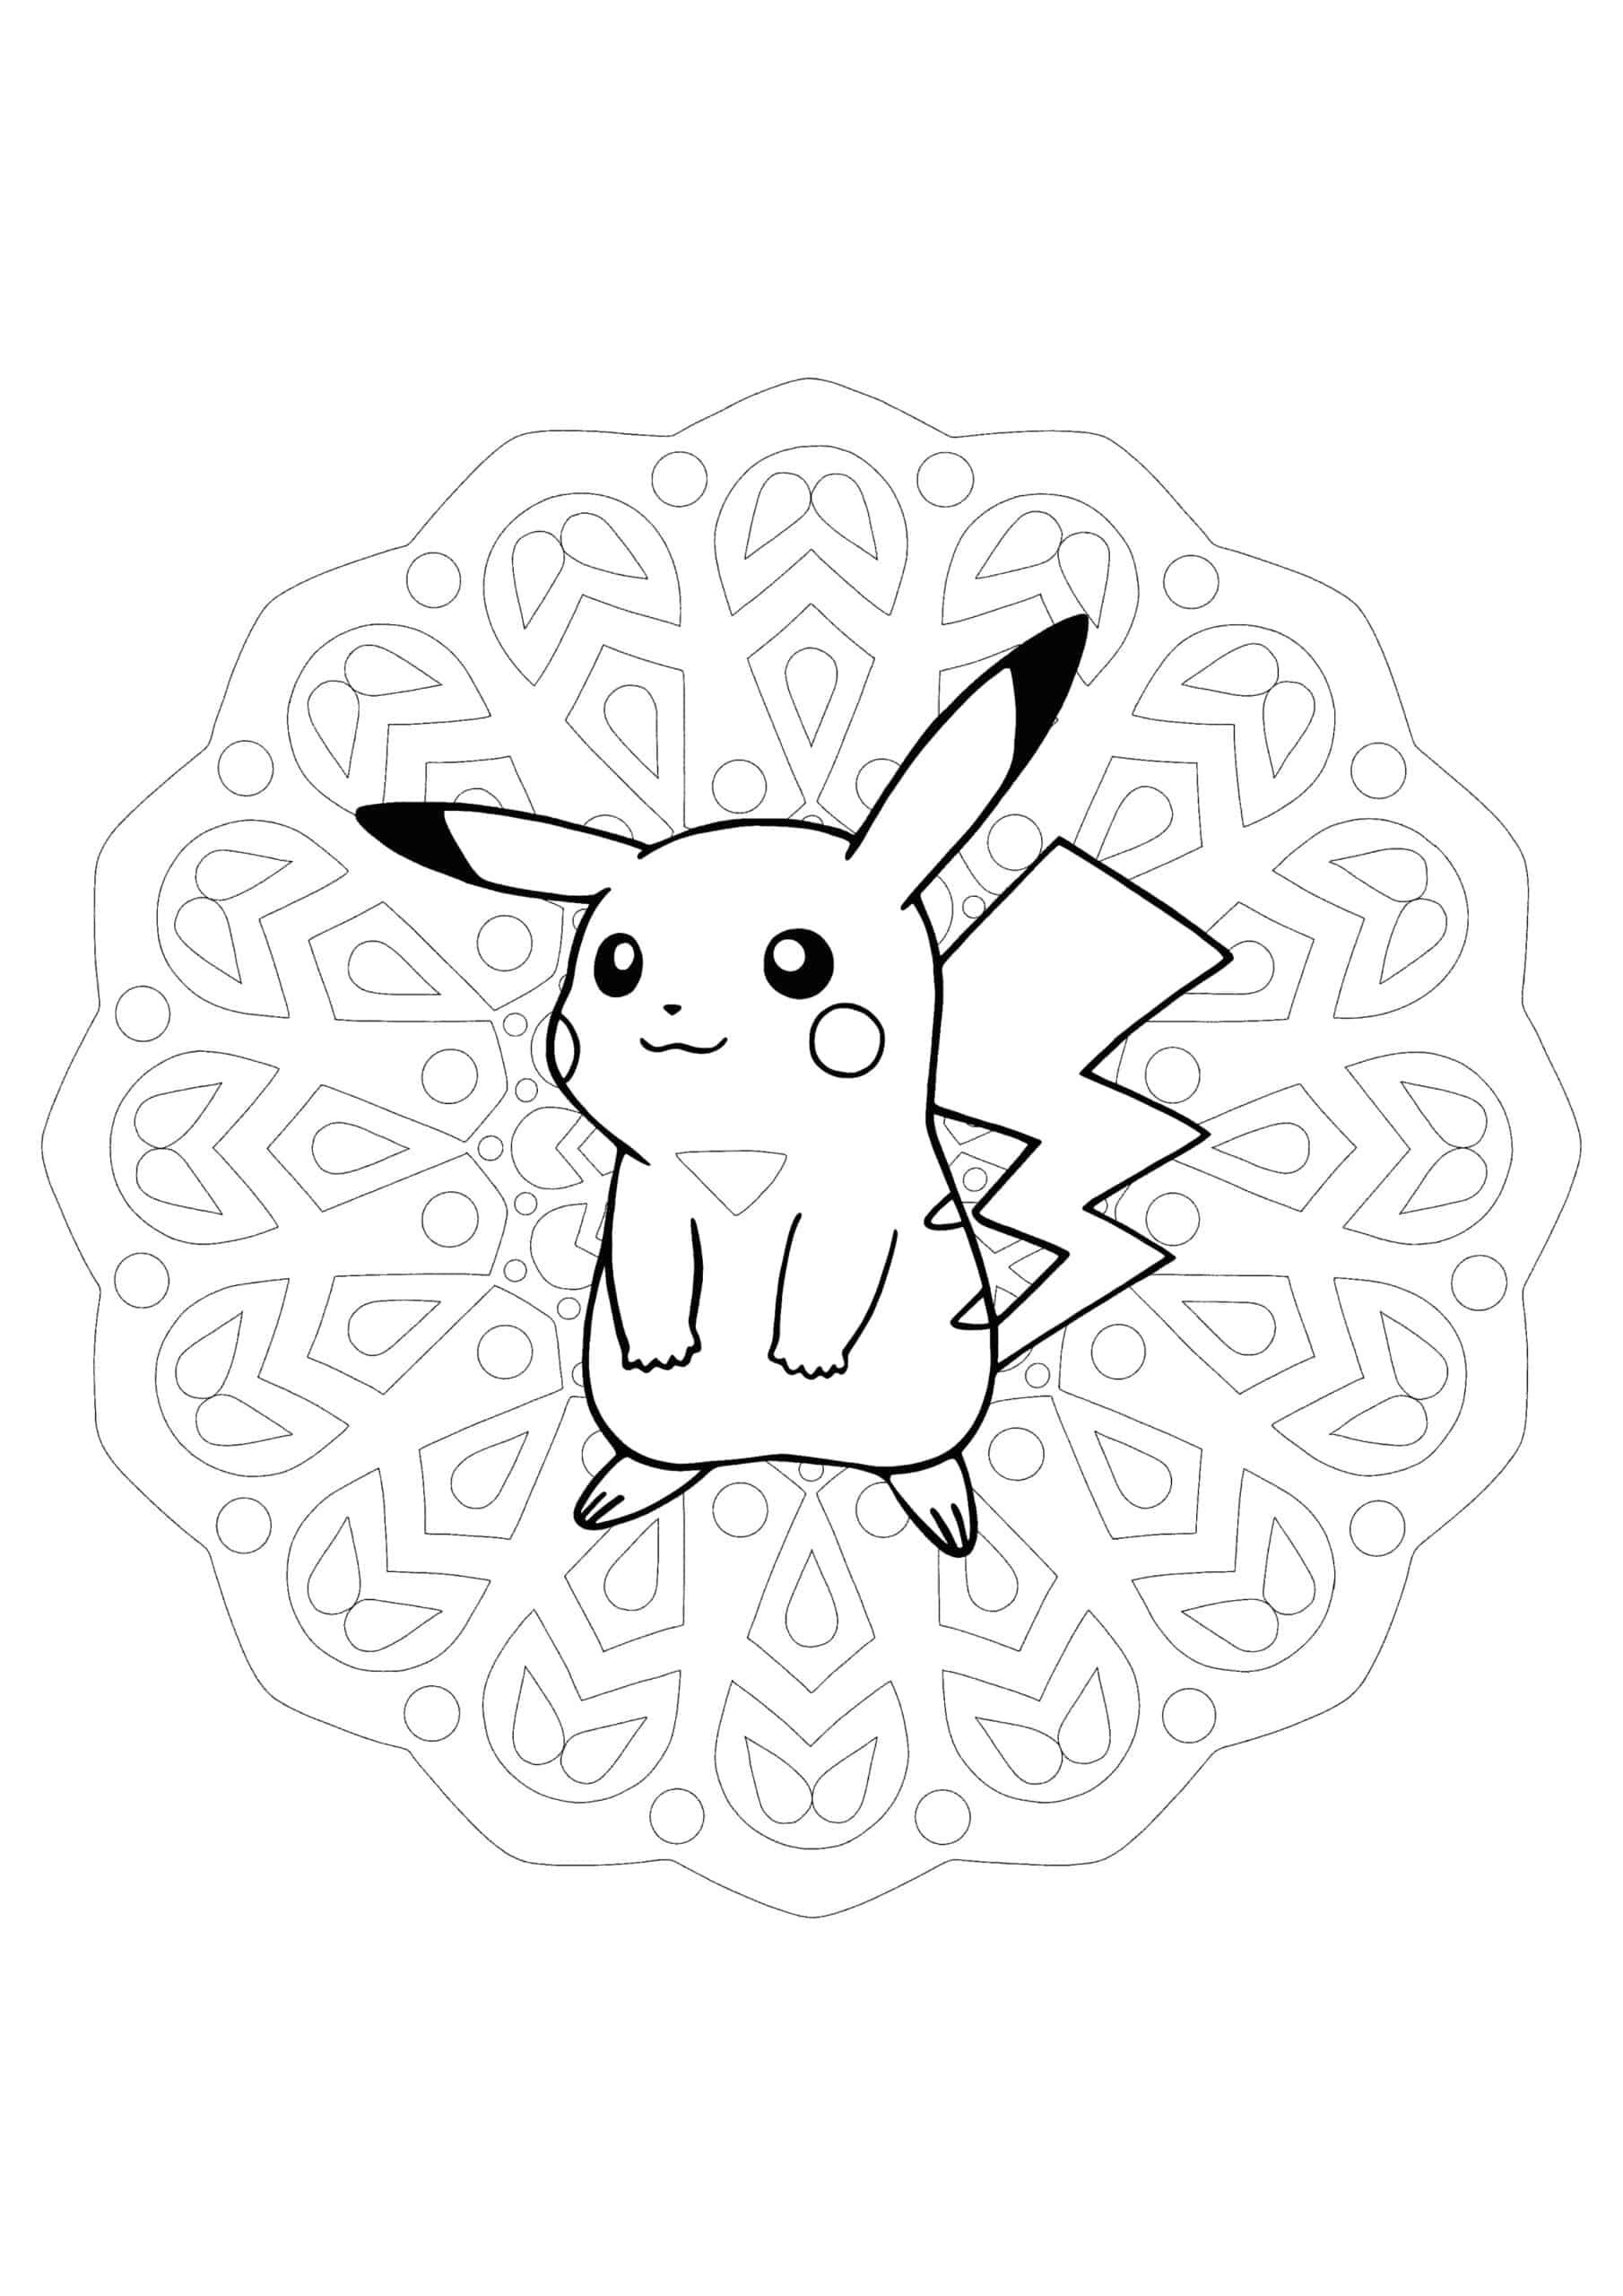 Pikachu Mandala coloring page